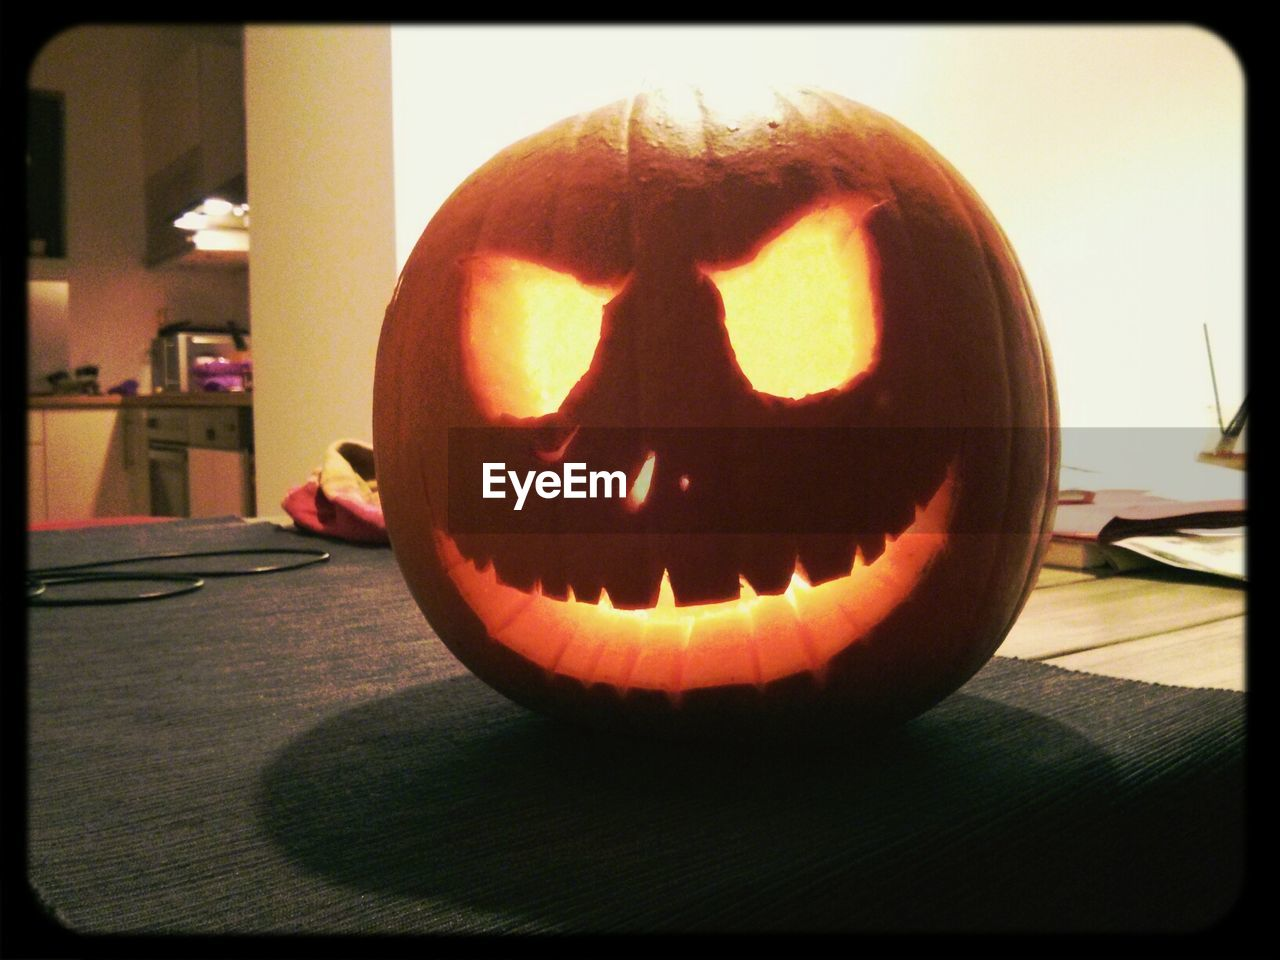 pumpkin, halloween, celebration, anthropomorphic face, jack o lantern, indoors, home interior, illuminated, no people, table, spooky, holiday - event, jack o' lantern, close-up, day